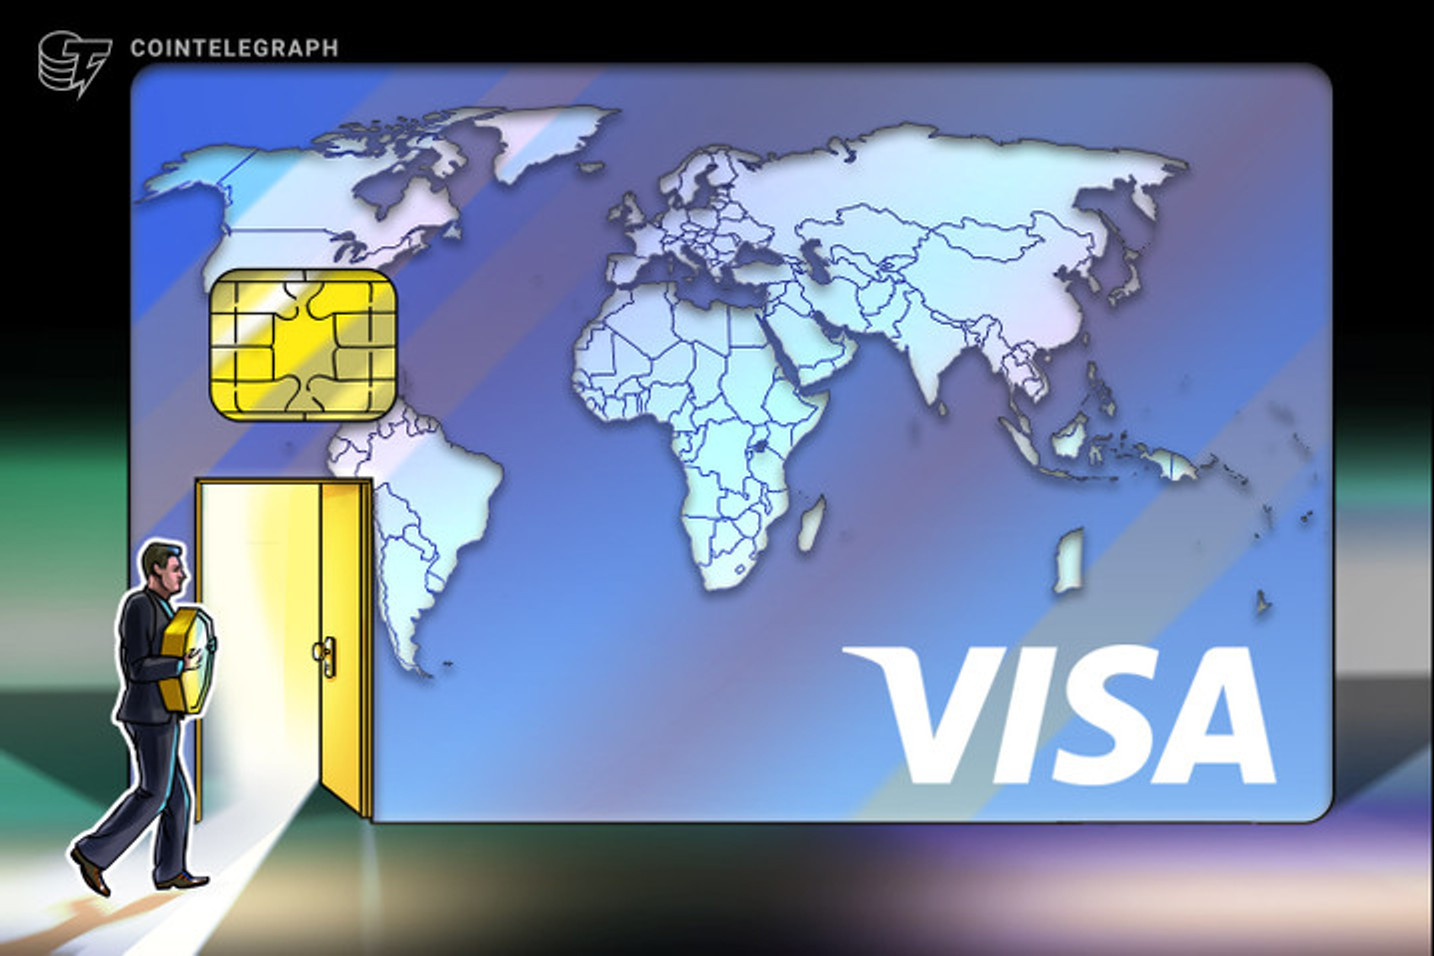 Visa计划支持购买加密资产,行业加速合规化